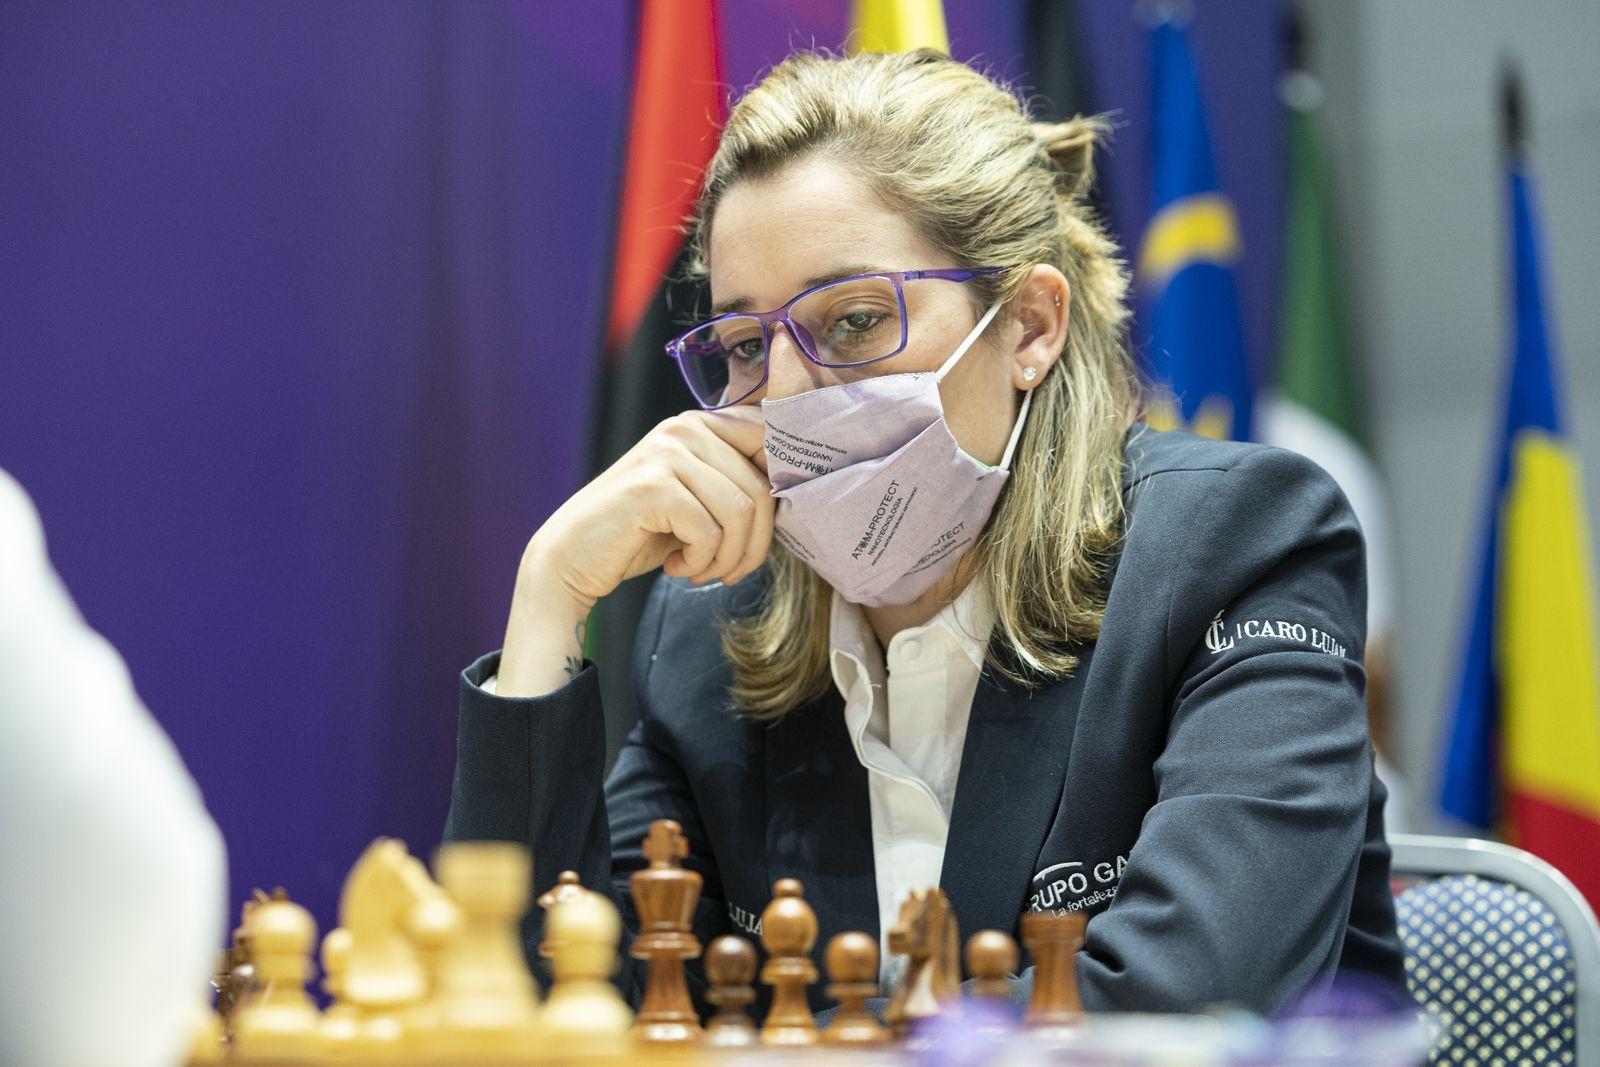 Caroline Lujan Argentina